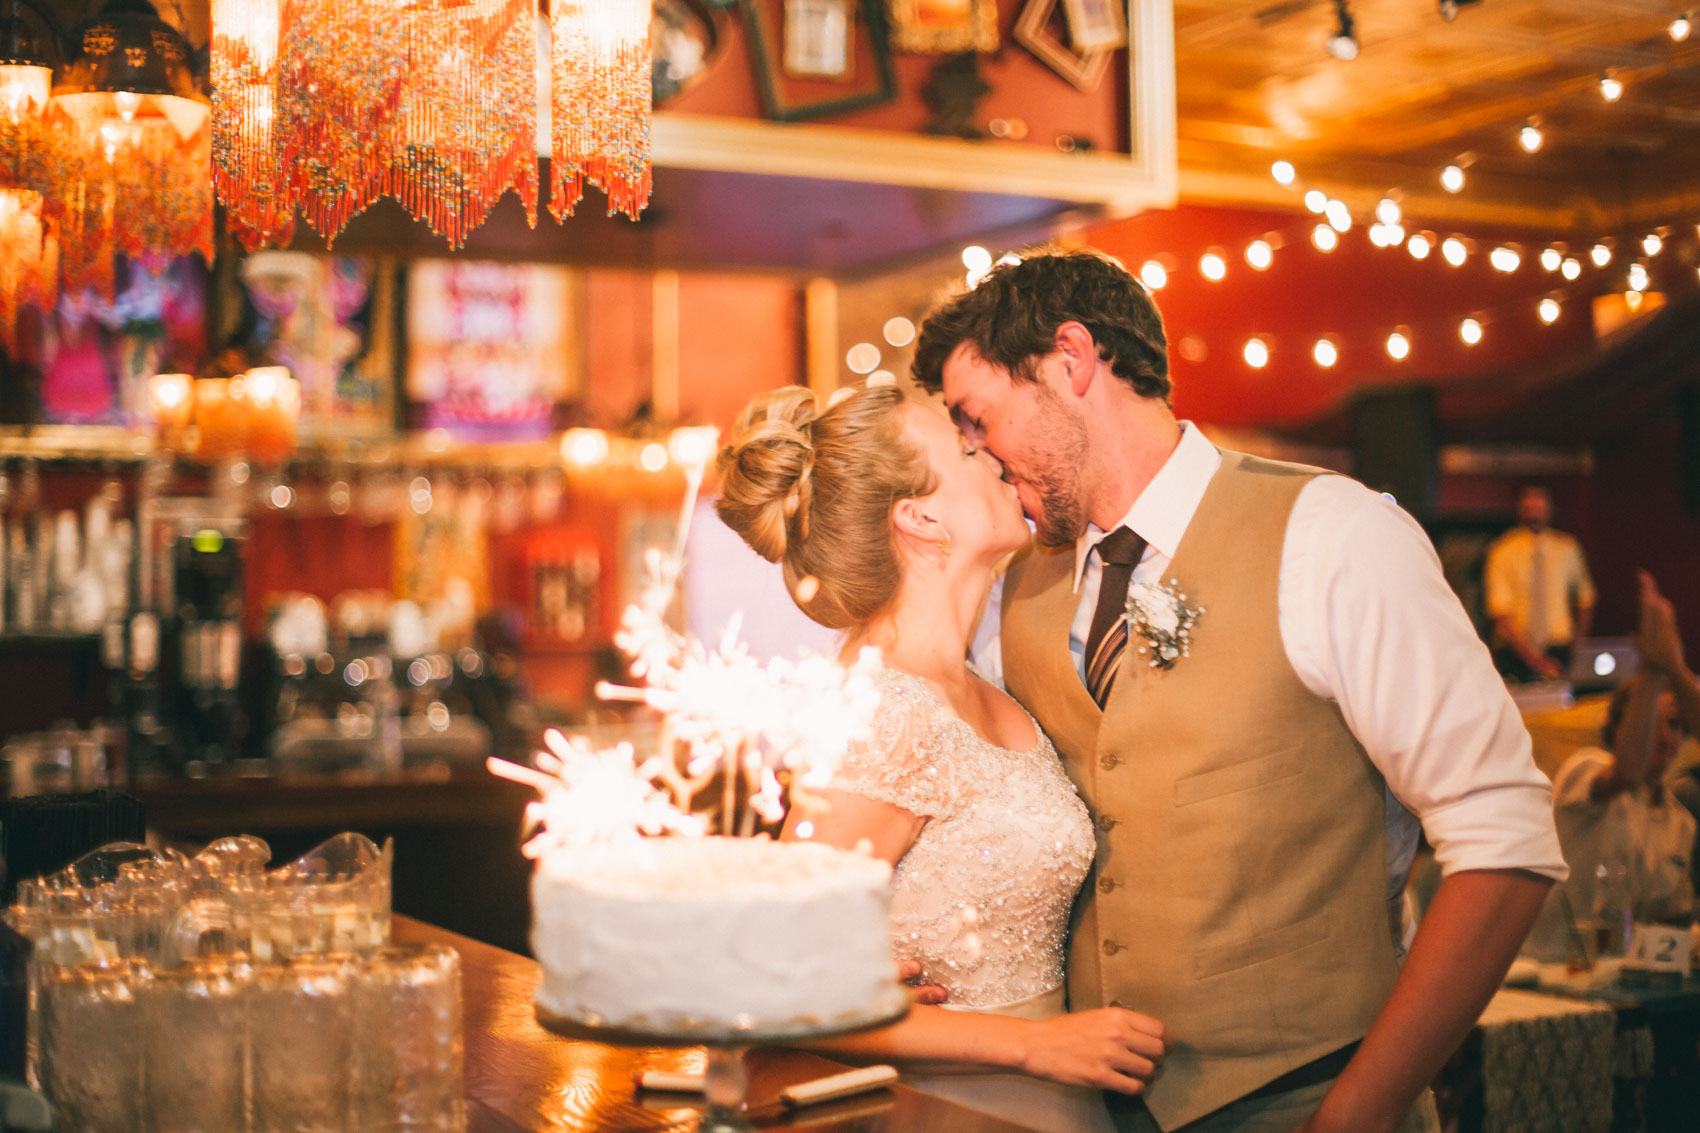 051_Crested Butte Wedding Photographer Secret Stash Woods Walk Ceremony Jamie Blue Bird Events Boho Epic Stars